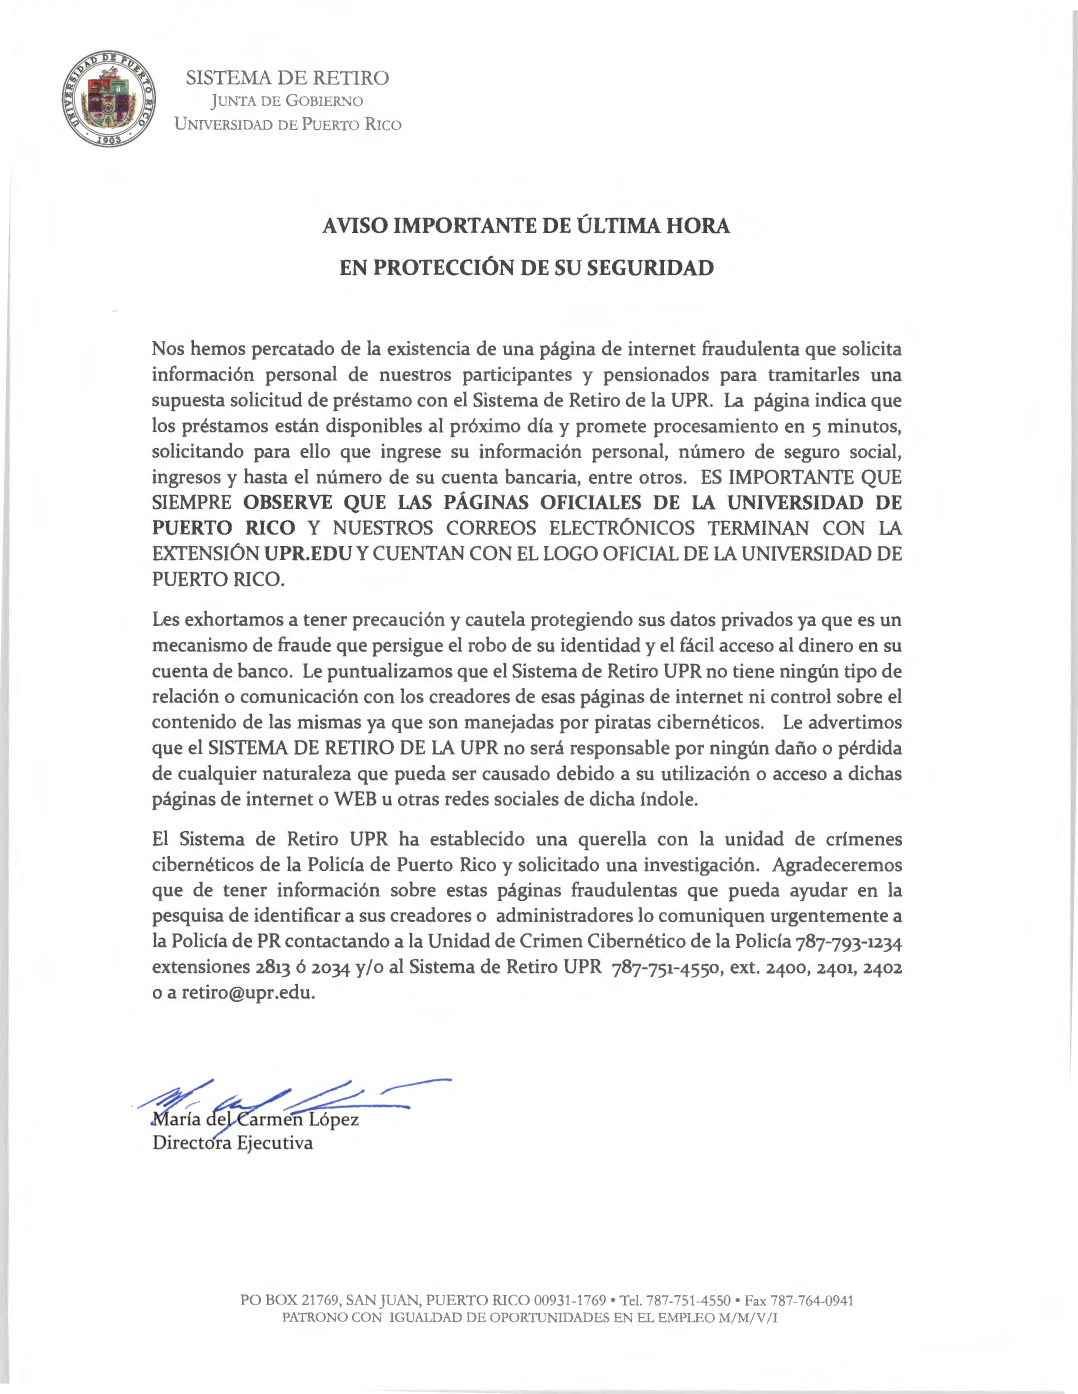 AVISO-IMPORTANTE-DE-ULTIMA-HORA